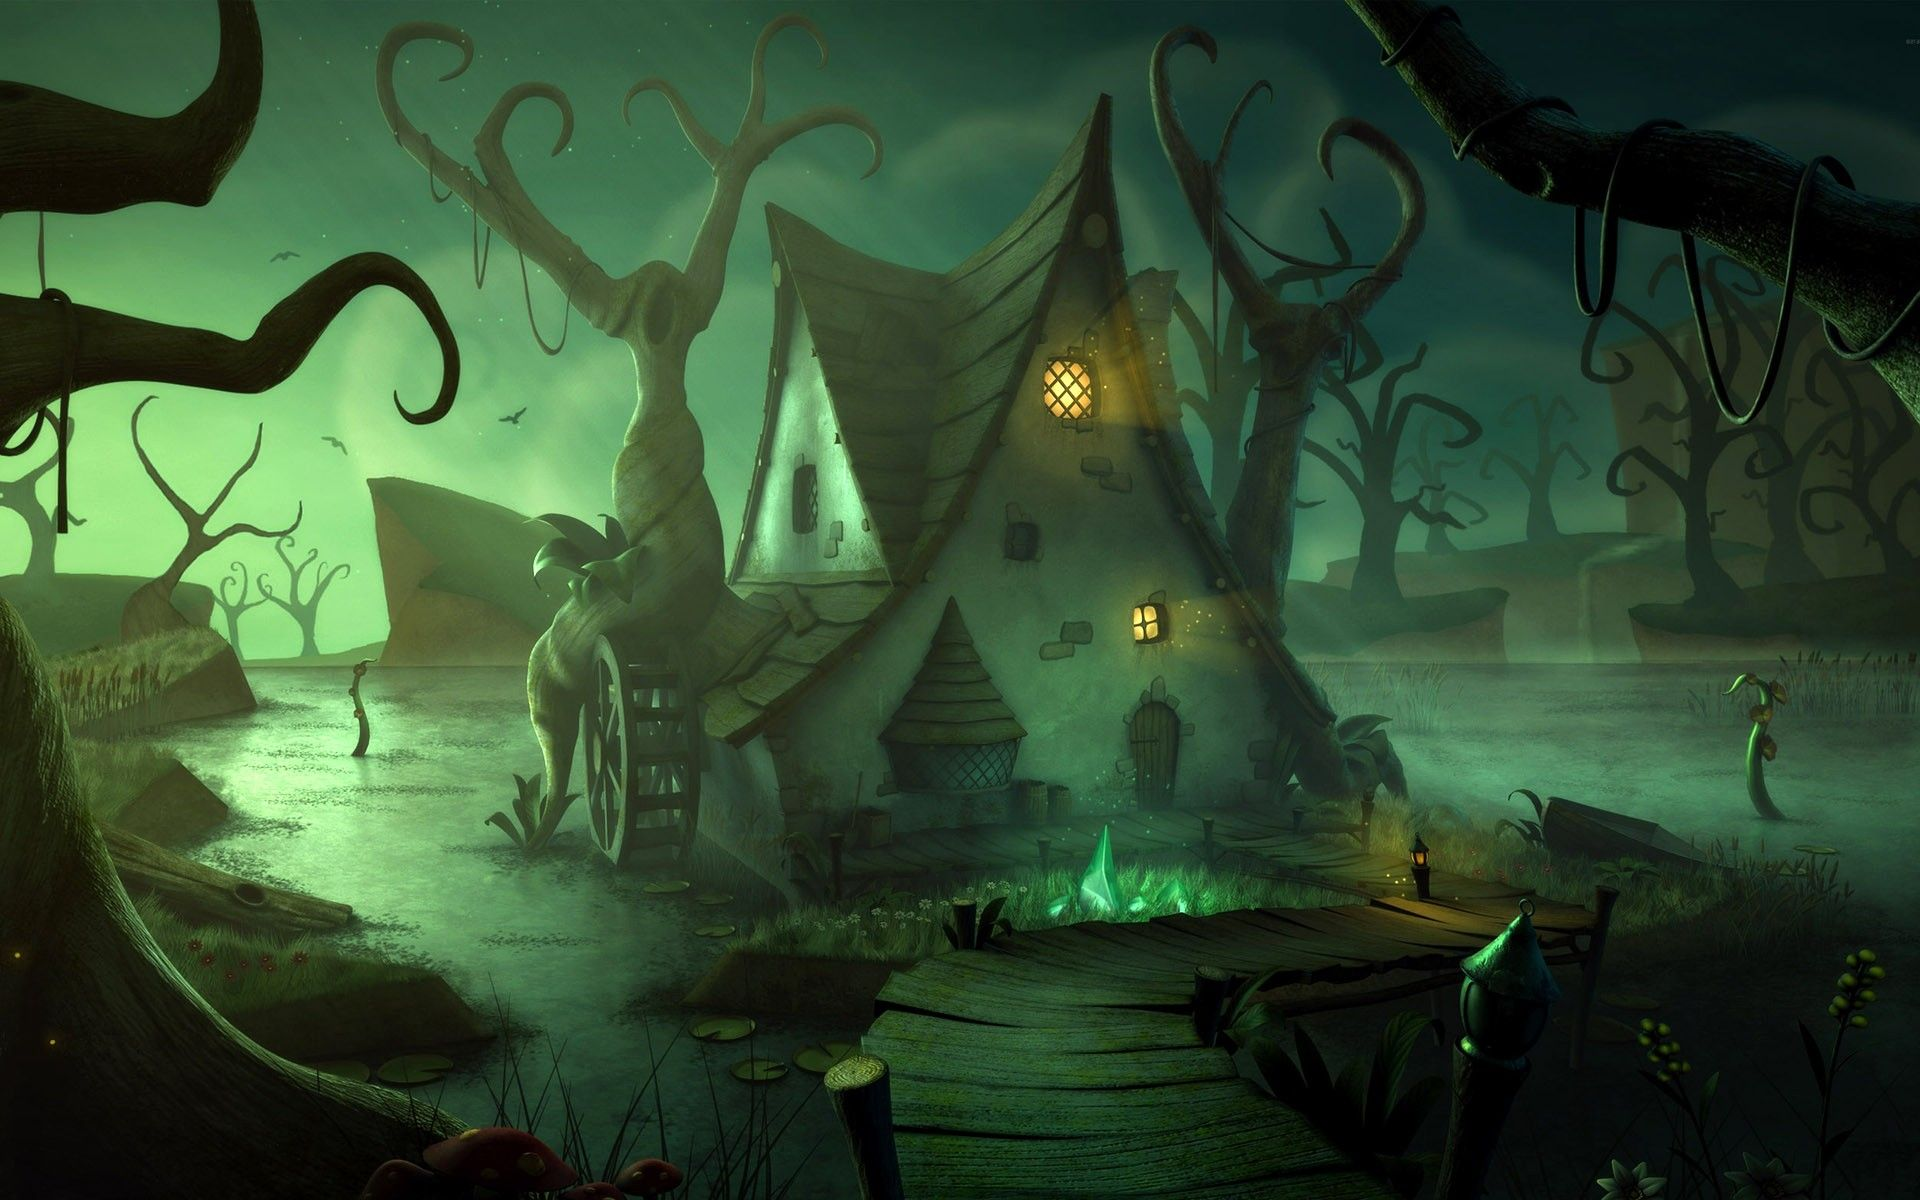 swamp art - Поиск в Google   Swamp   Halloween wallpaper ...